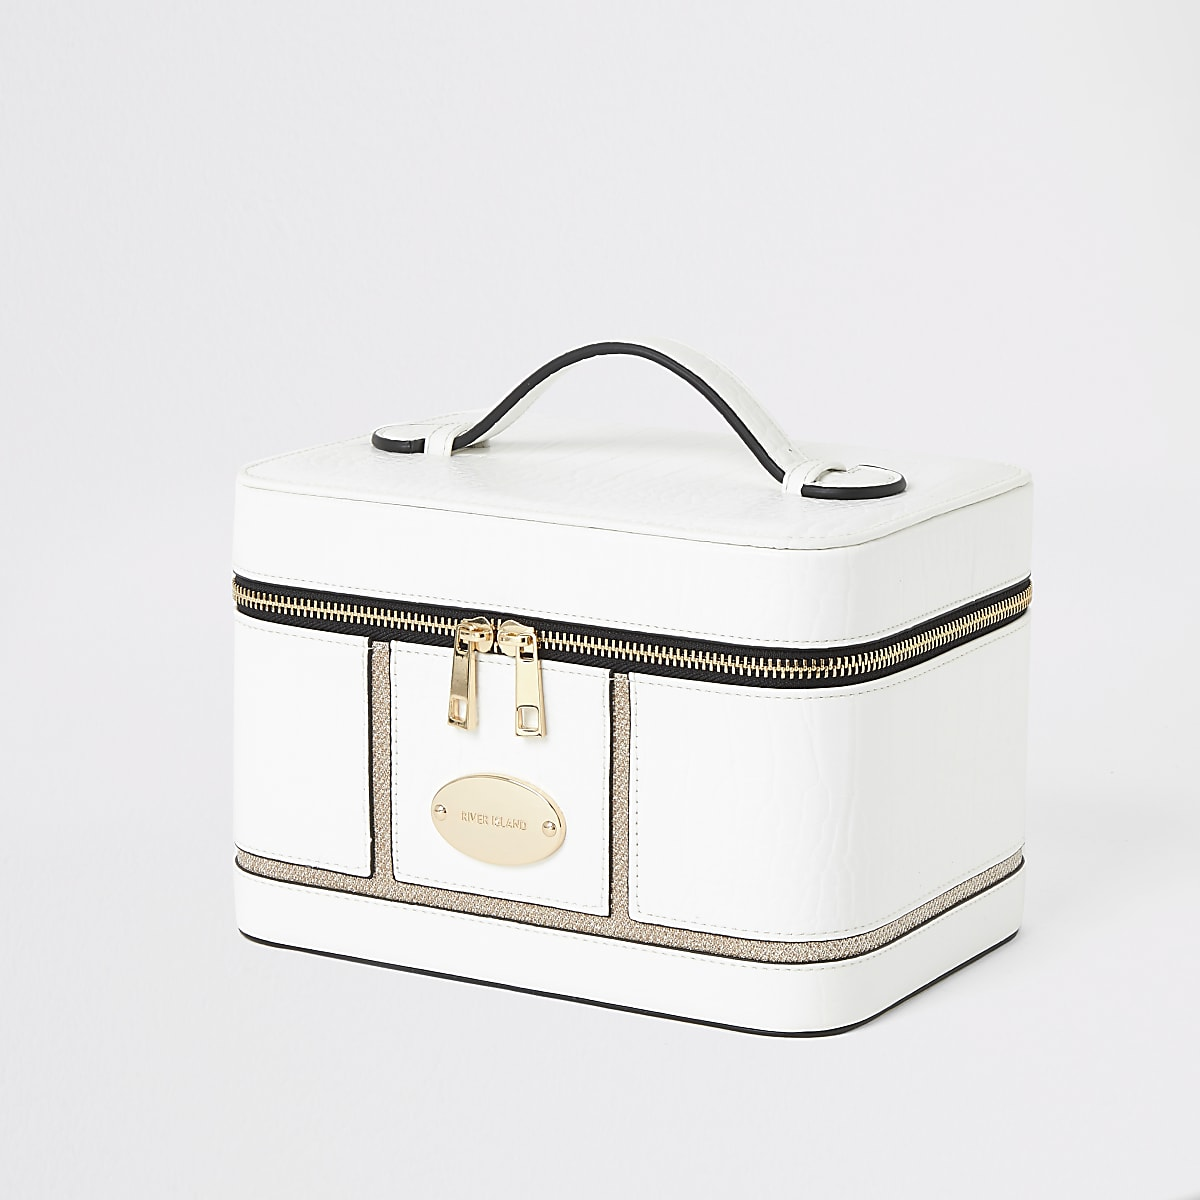 b835c6761 White croc embossed vanity case - Makeup Bags - Bags & Purses - women